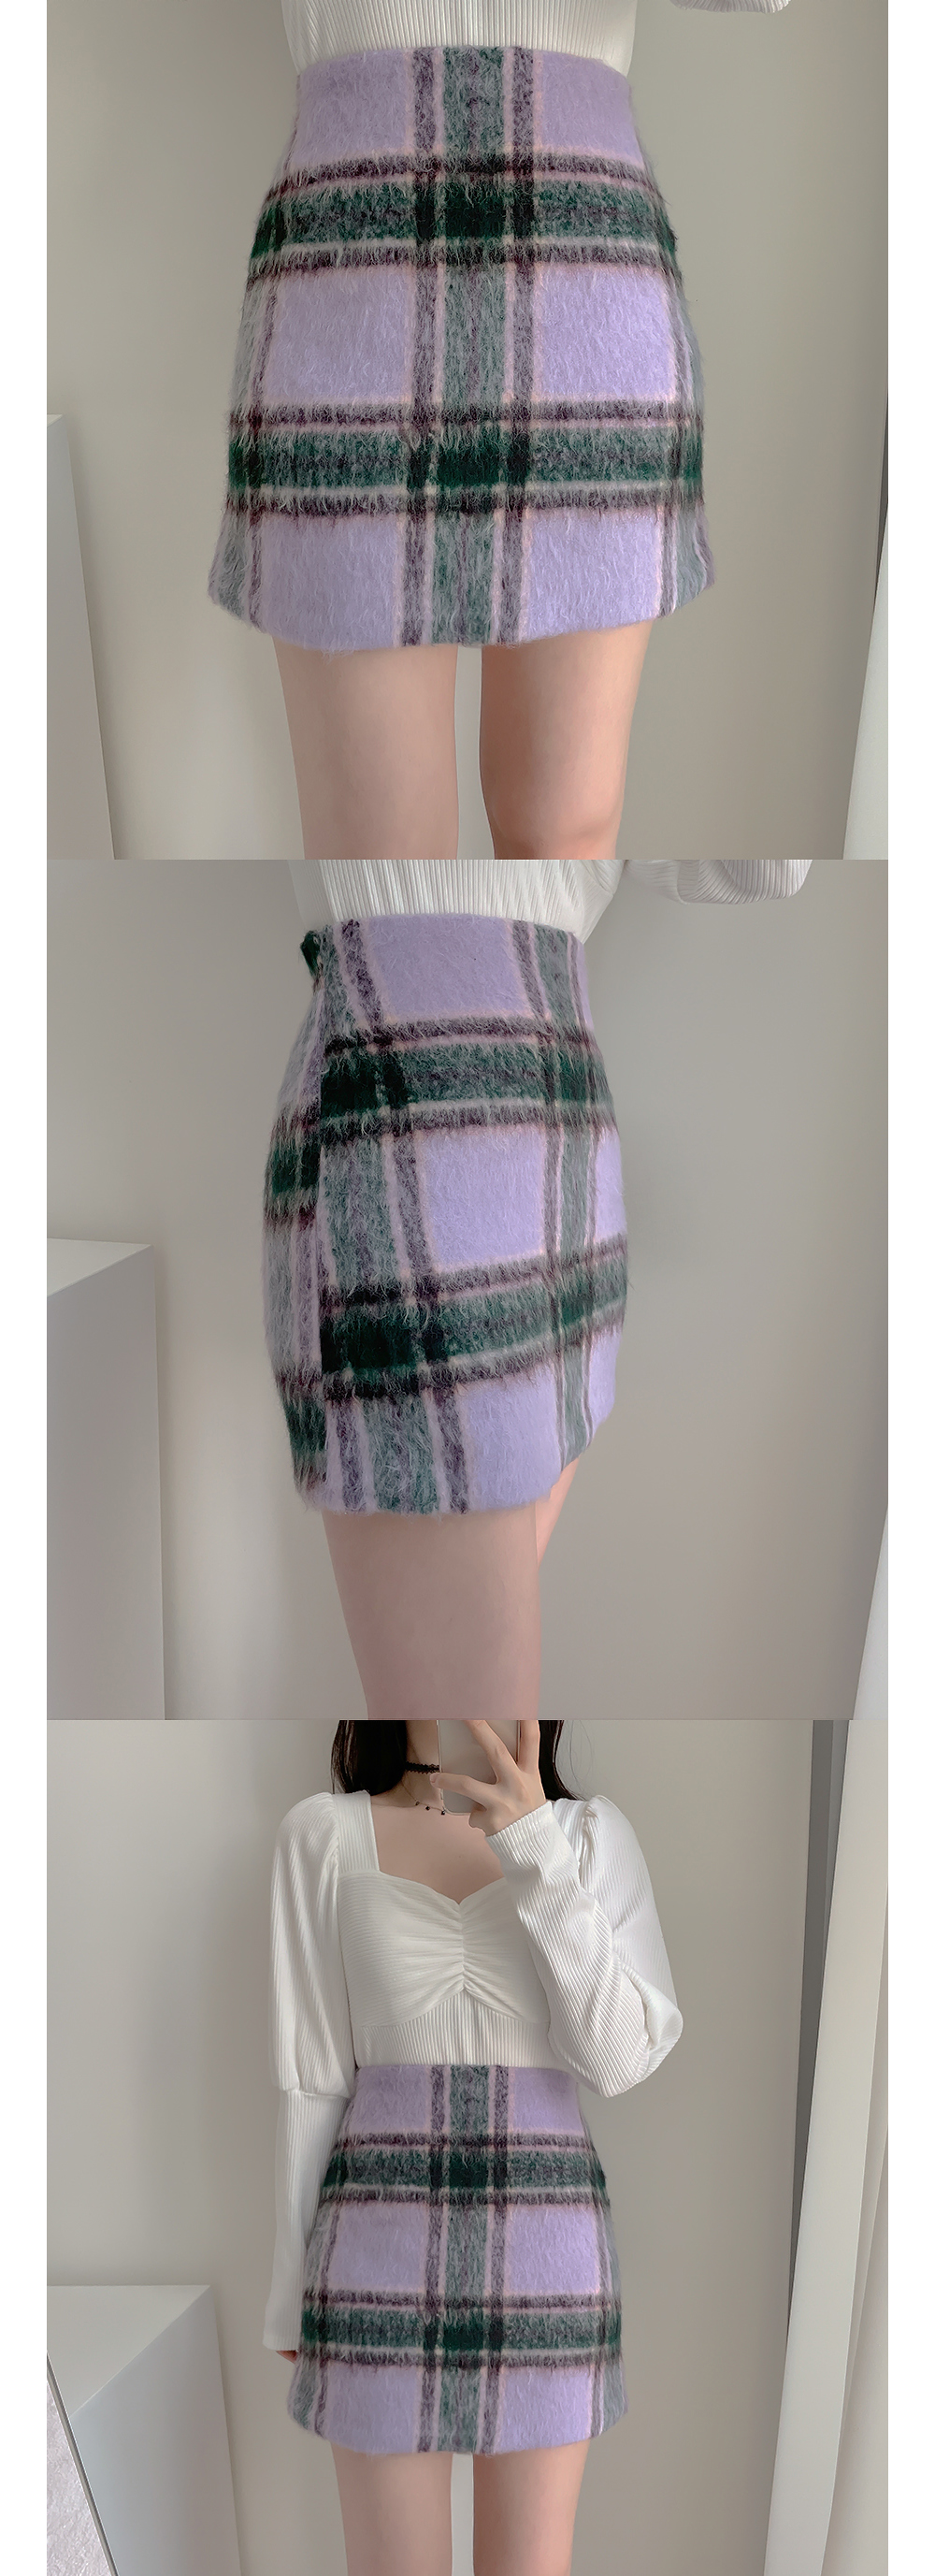 Sofia Puff Shirring Ribbed Knitwear Tee 3color